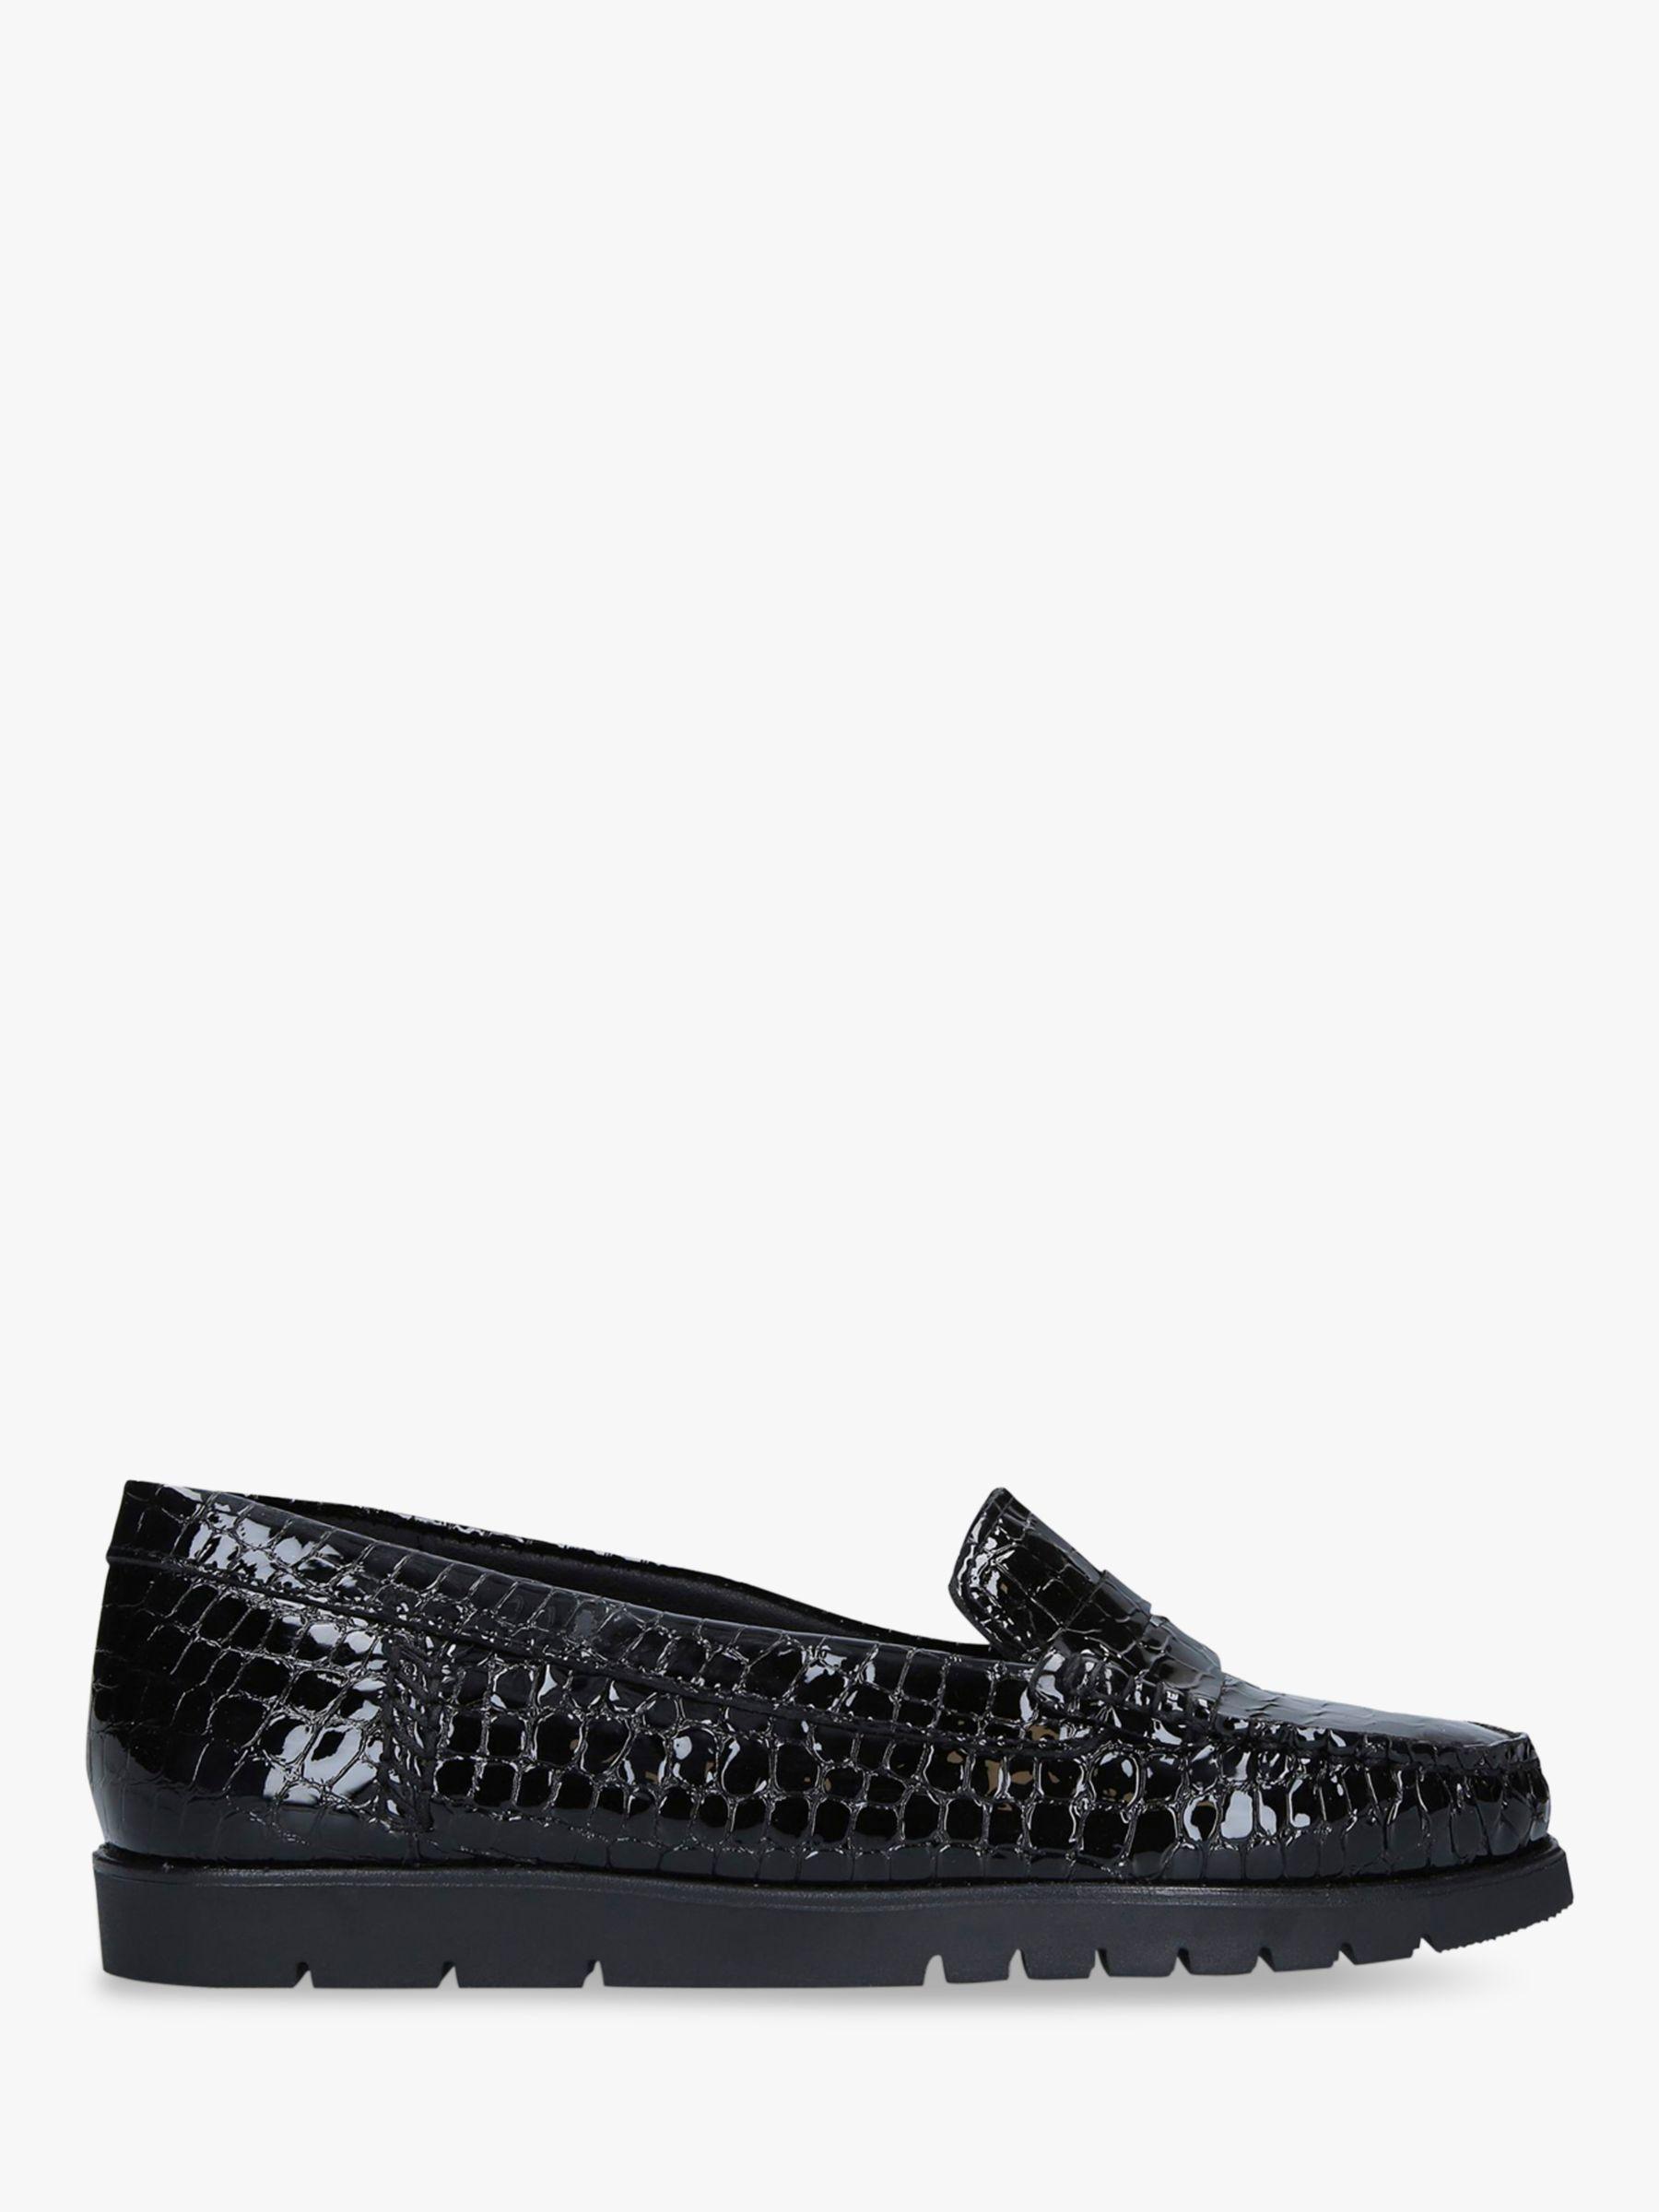 Carvela Comfort Carvela Comfort Cath Croc Print Patent Loafers, Black